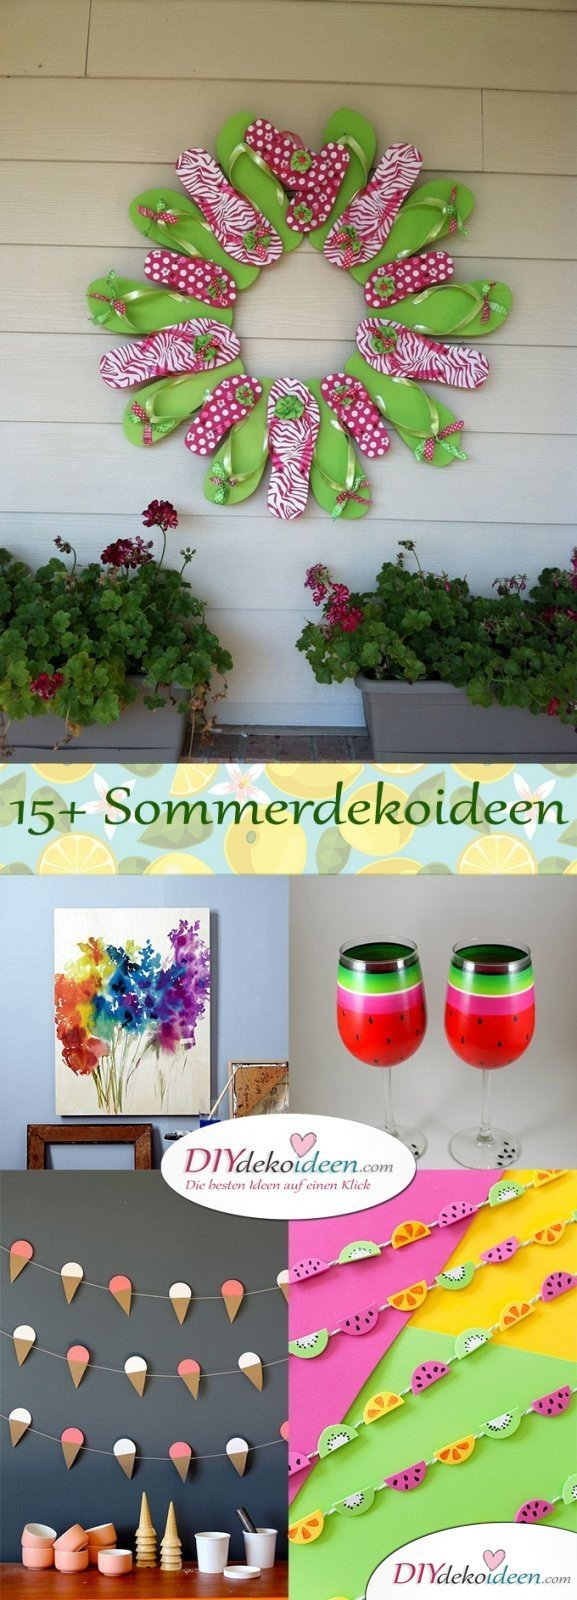 Sommerdeko - DIY Dekoideen